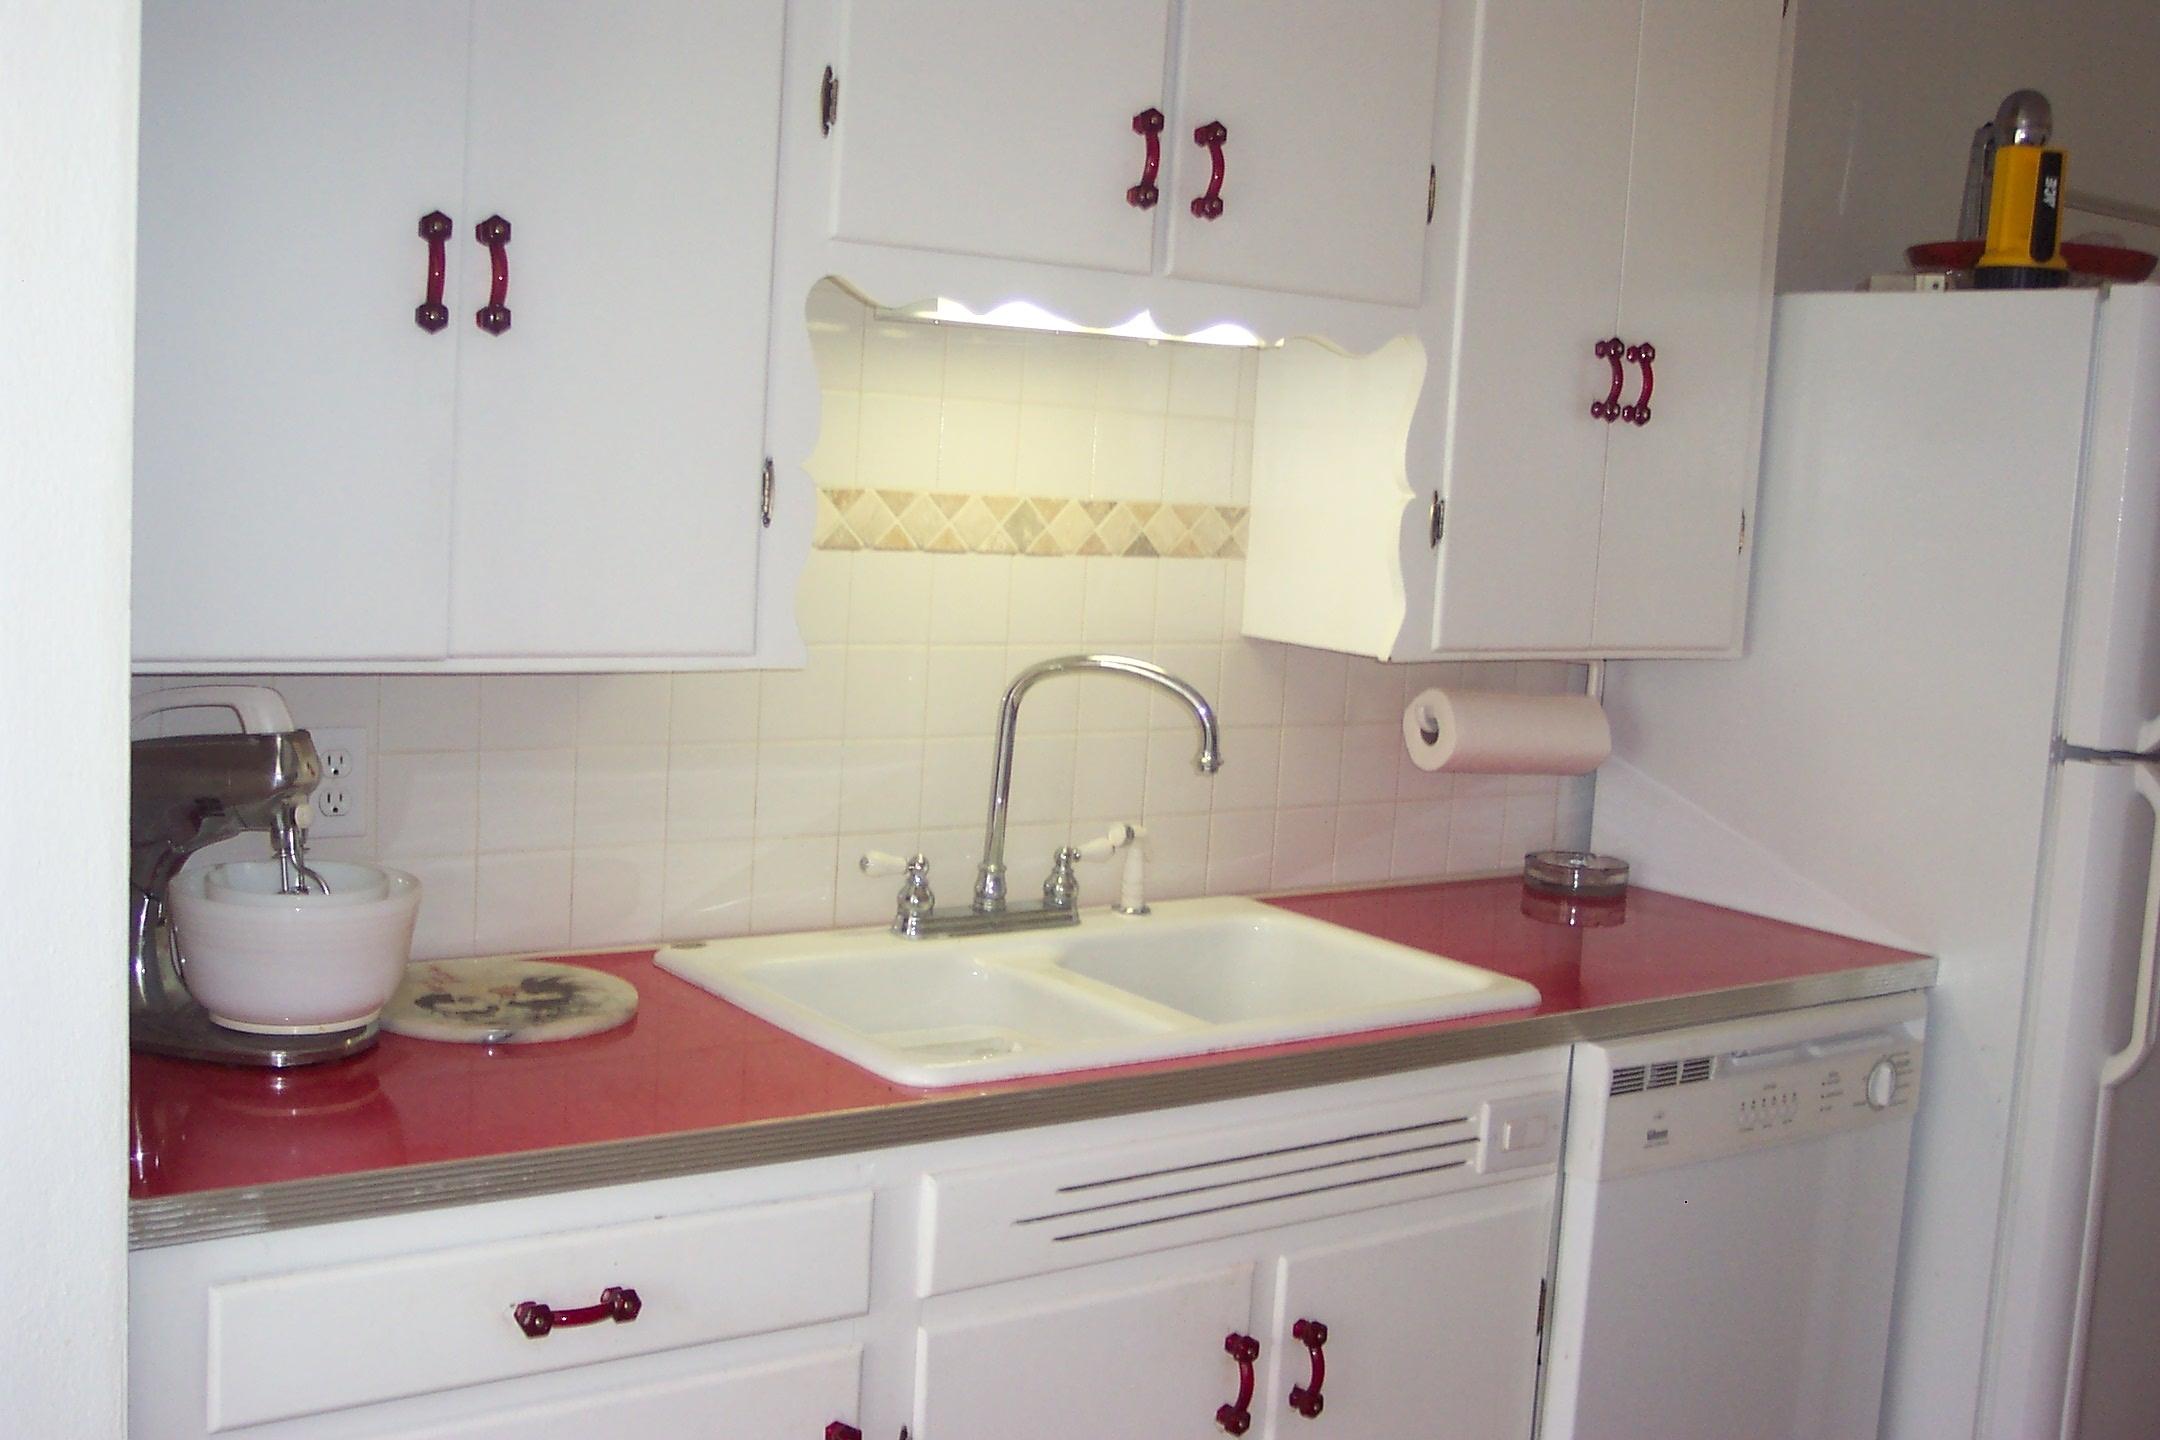 Vintage Retro Kitchen Countertops